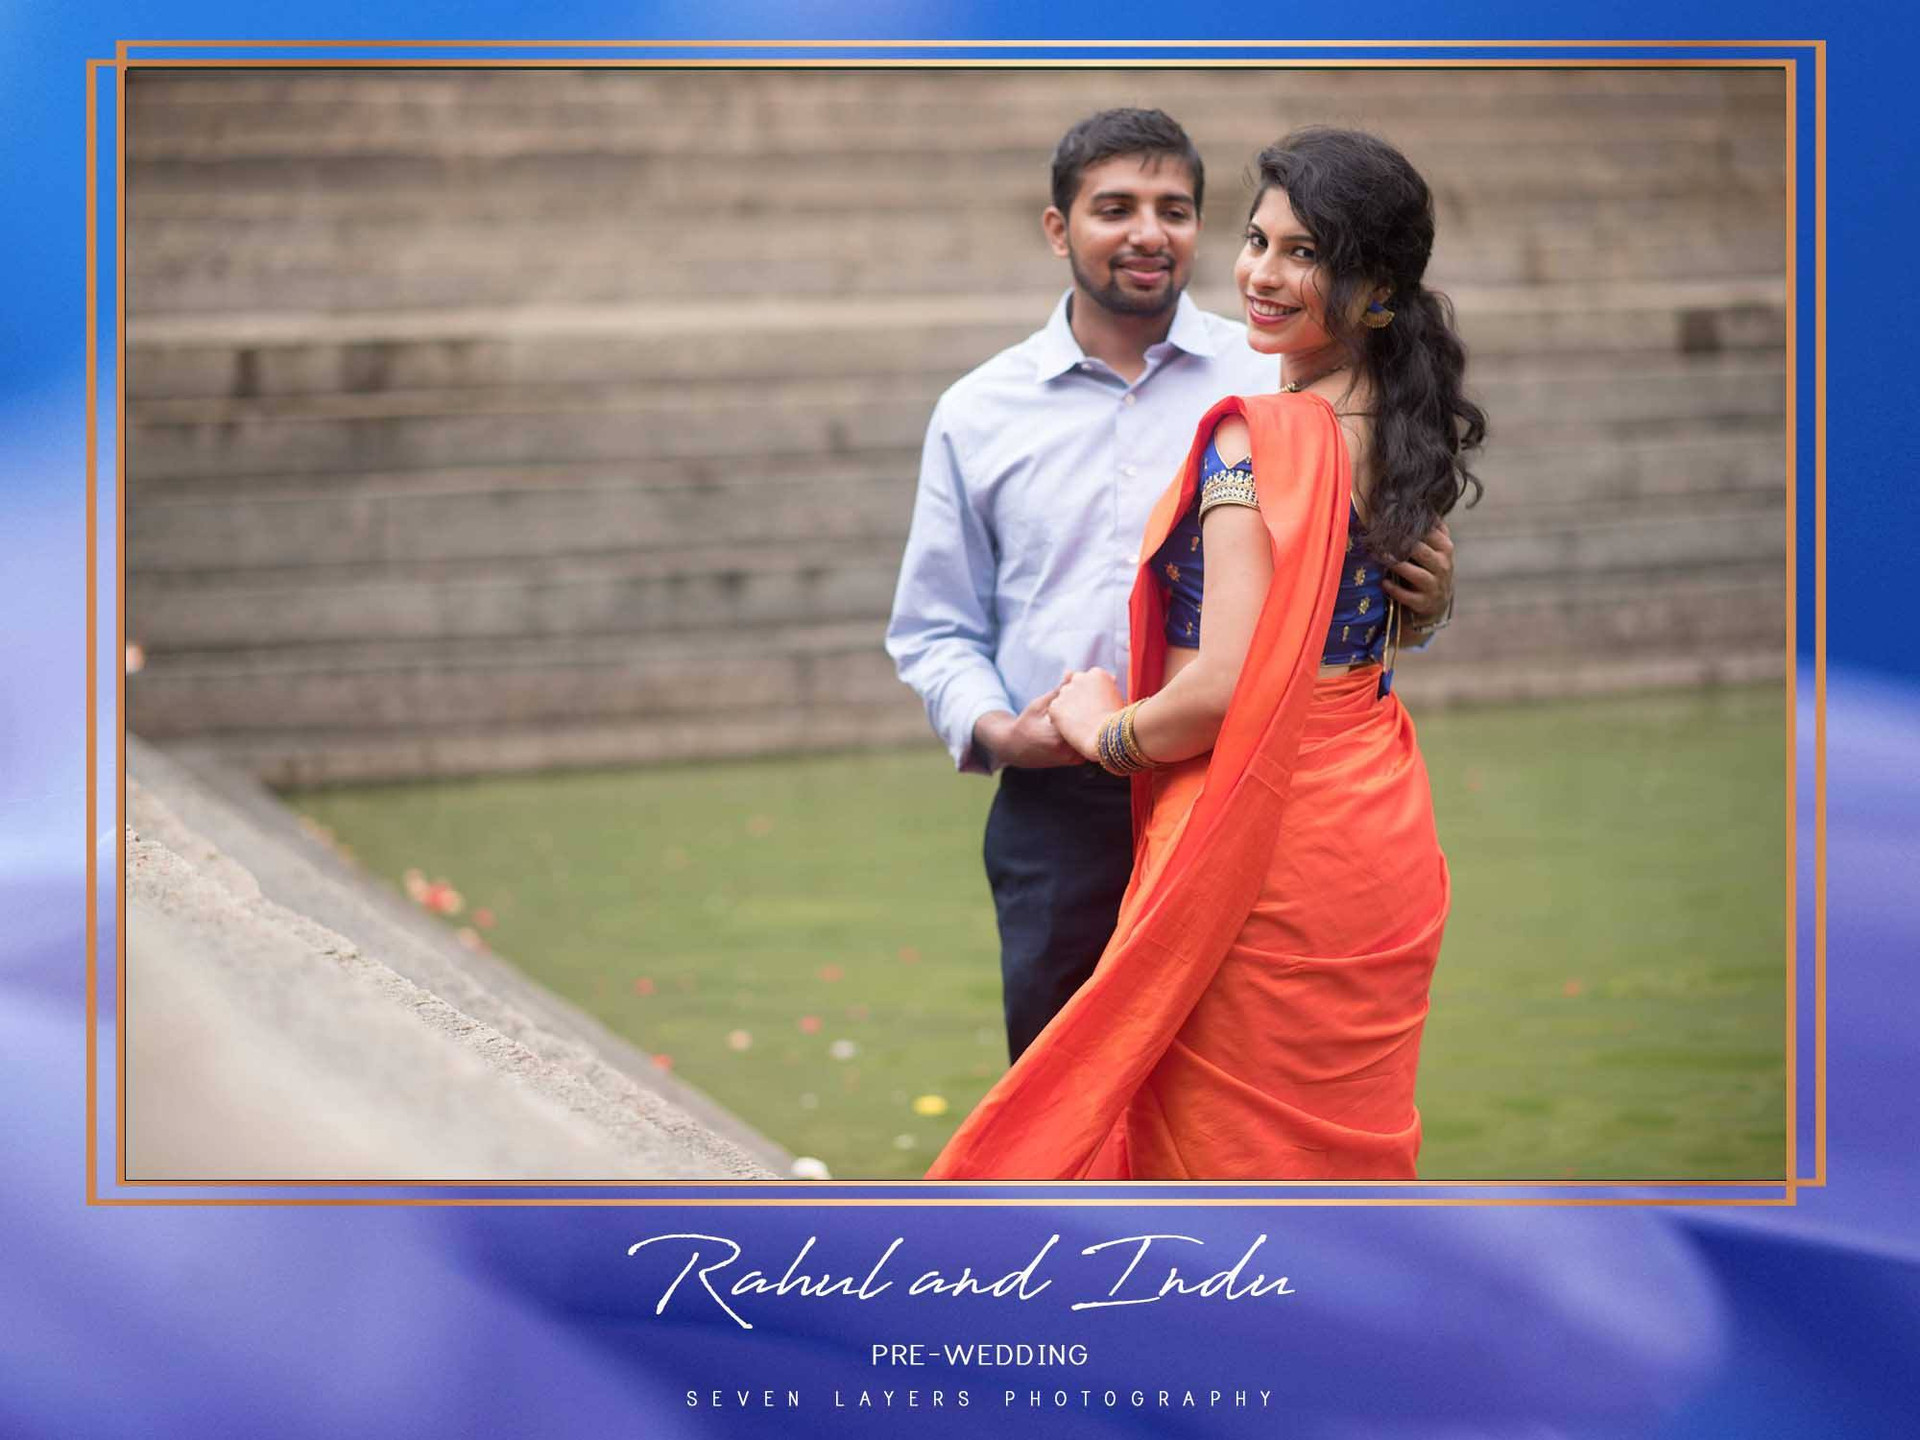 Pre-Wedding_Pose_rahul_Seven Layers Photography (1)